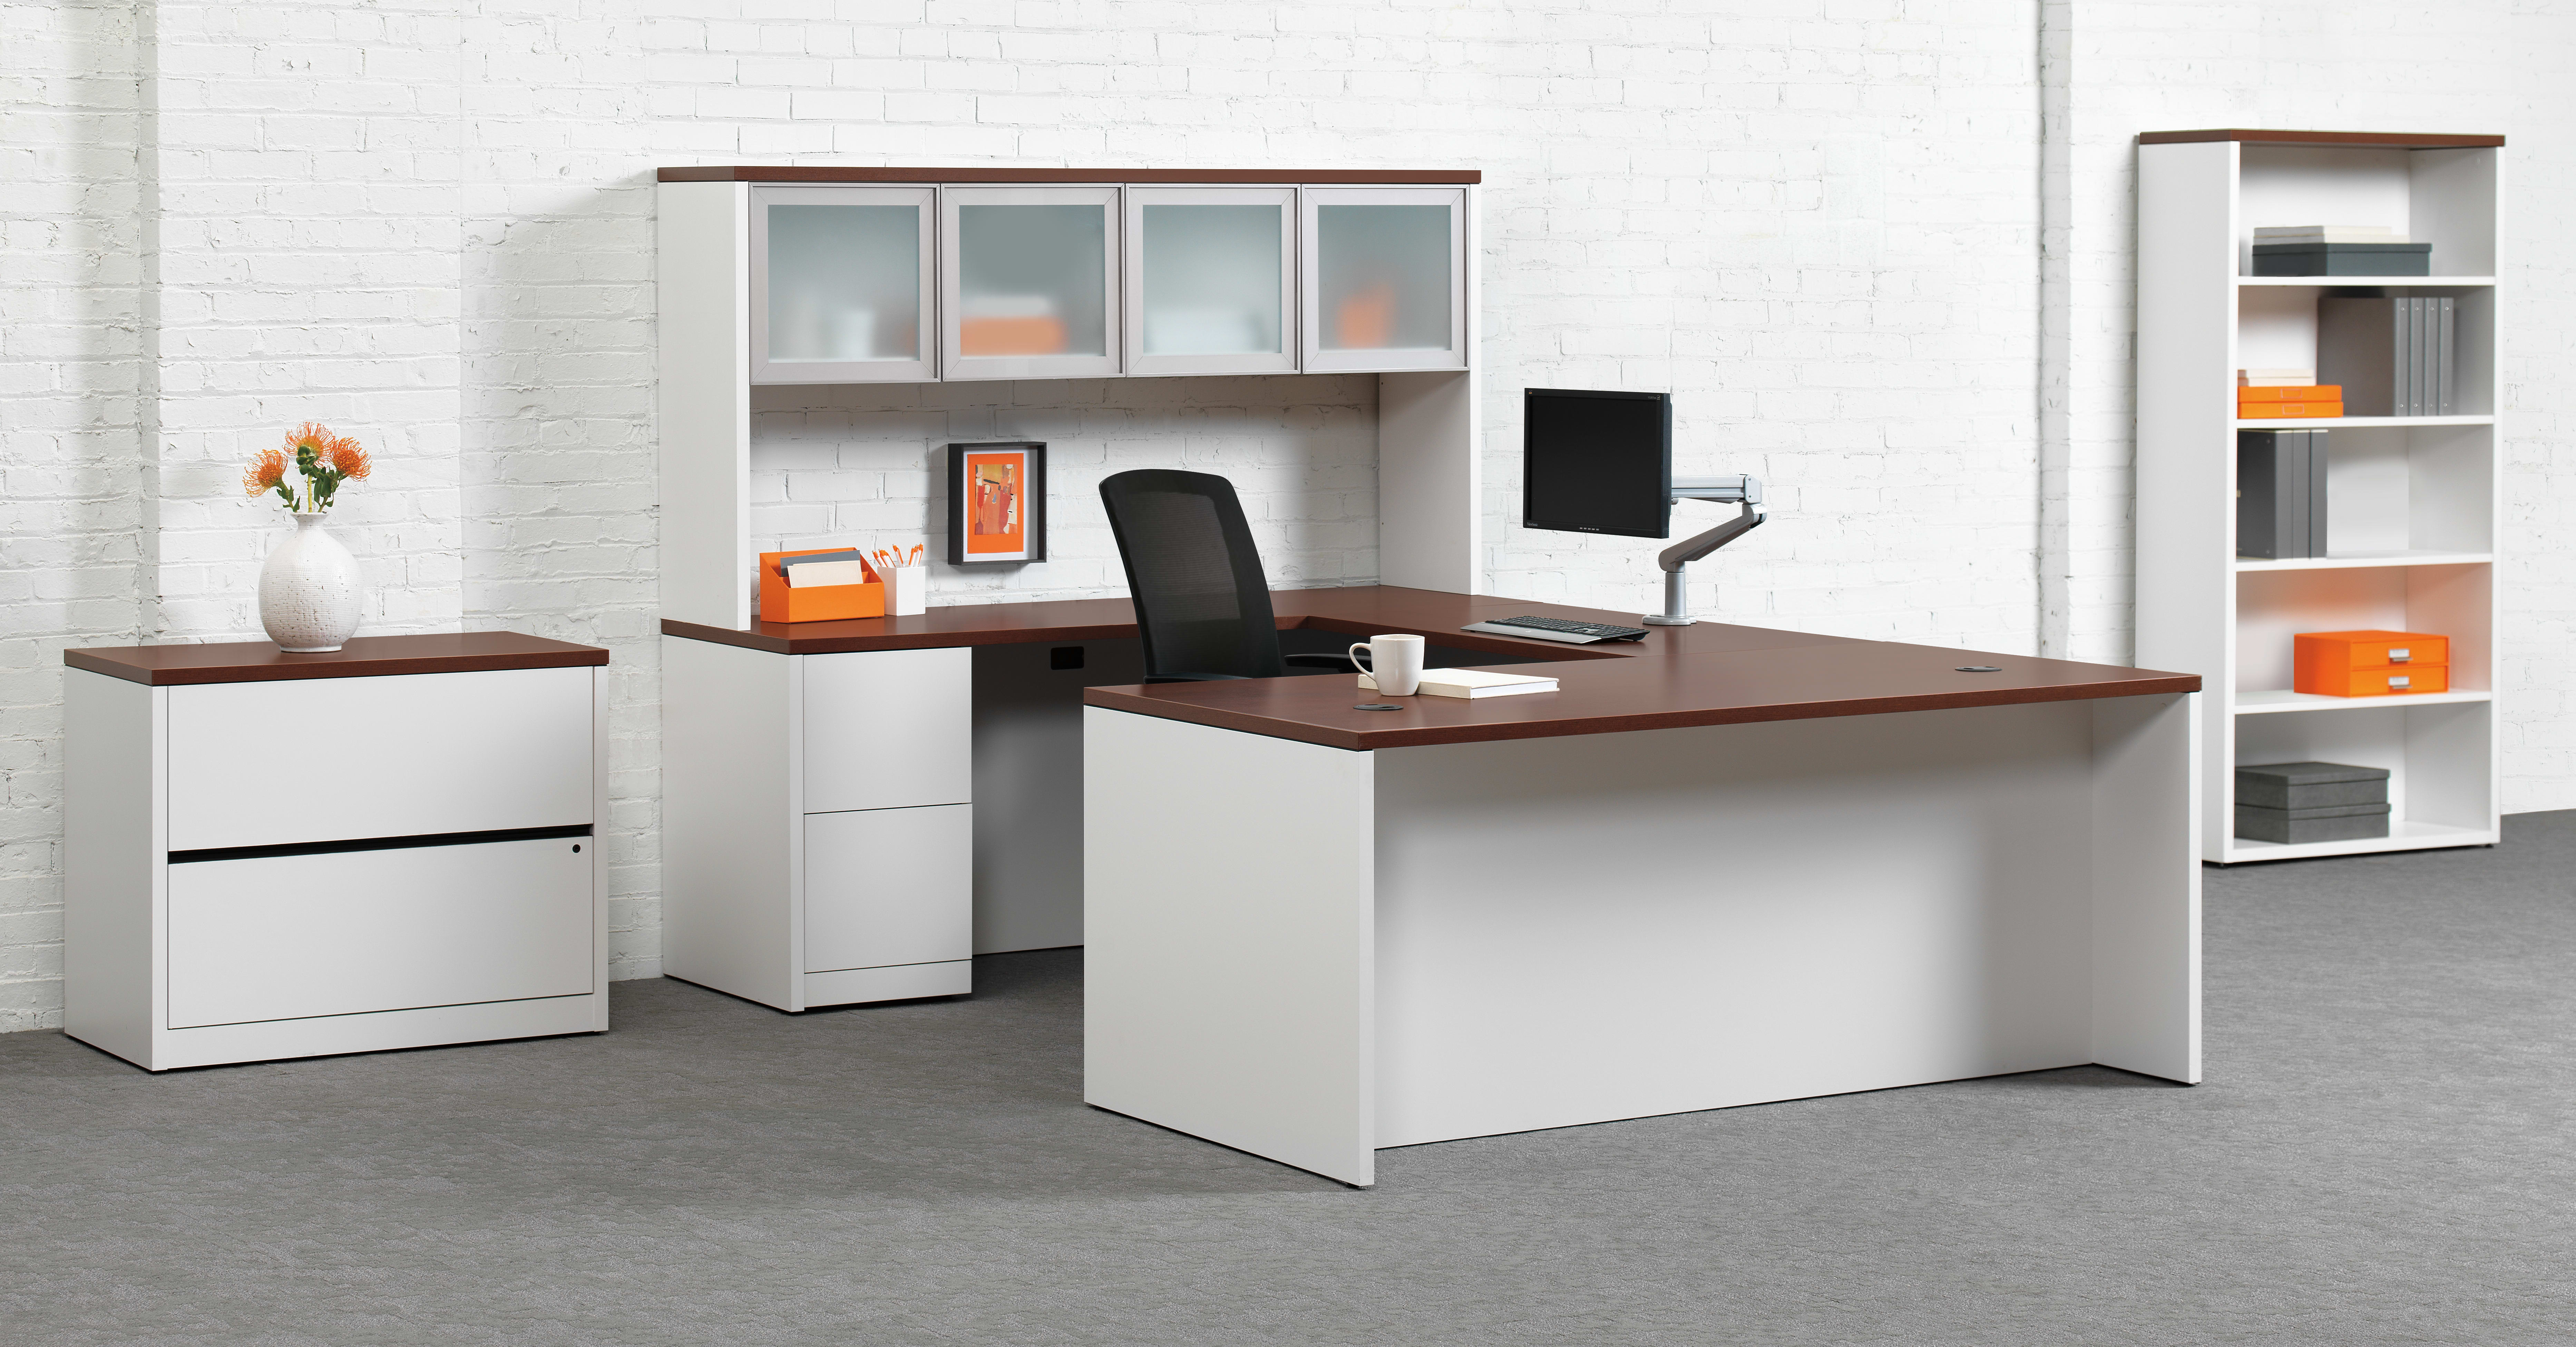 Bridges Hon Office Furniture